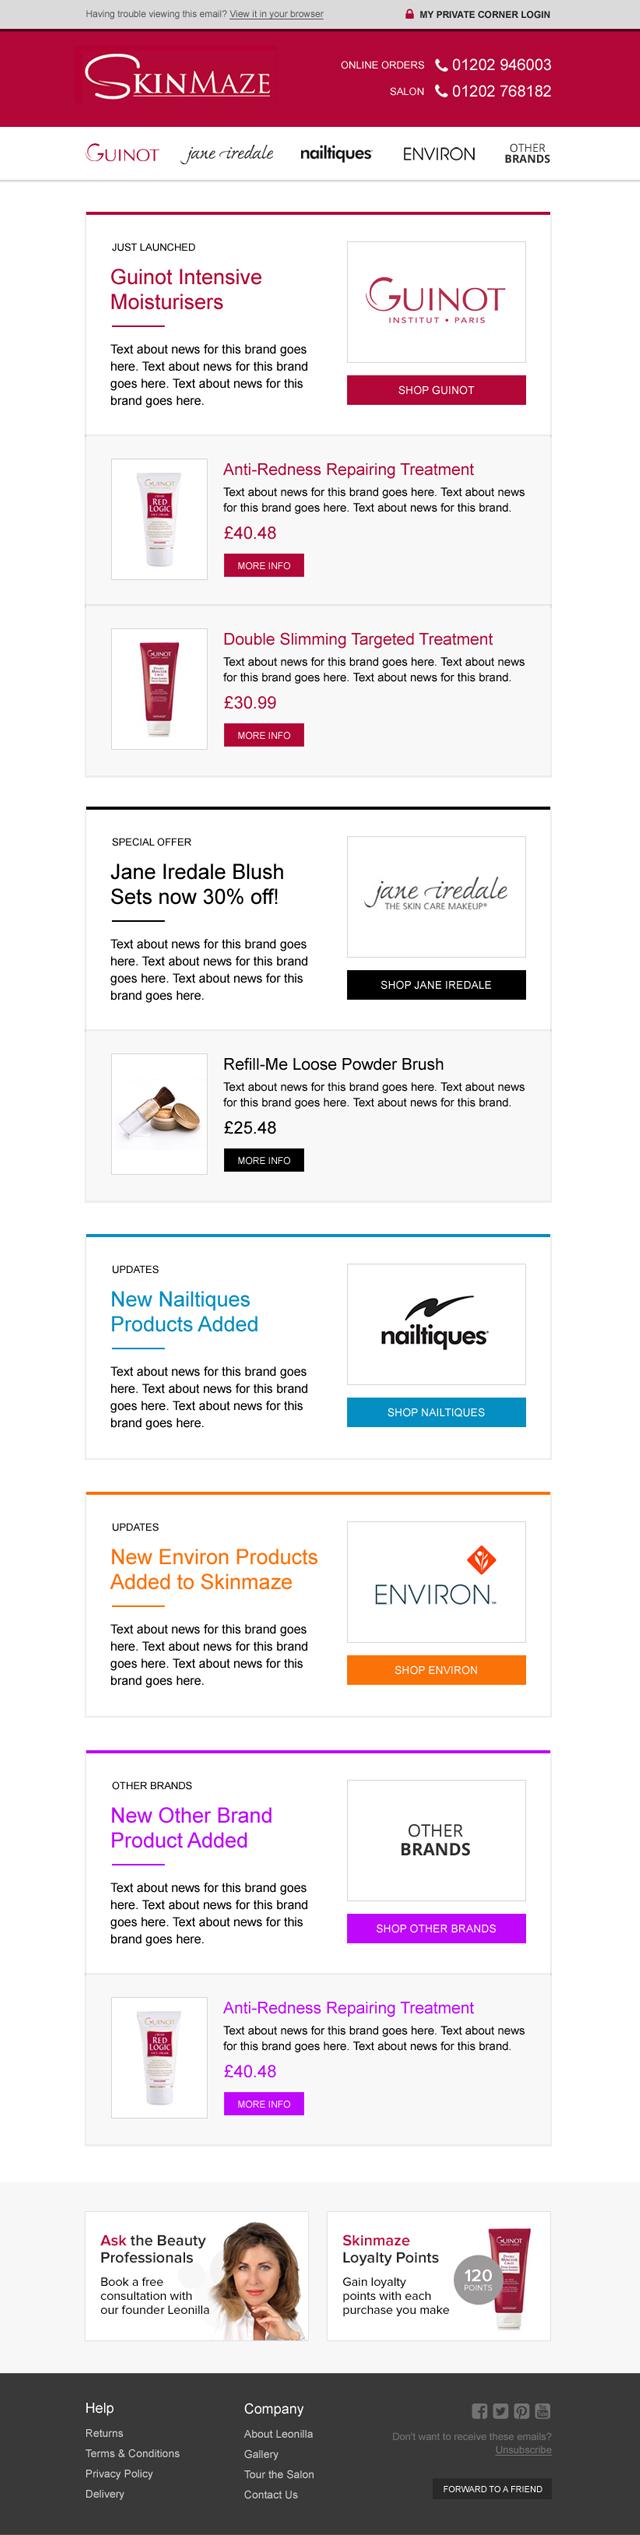 beauty-salon-email-newsletter-design2